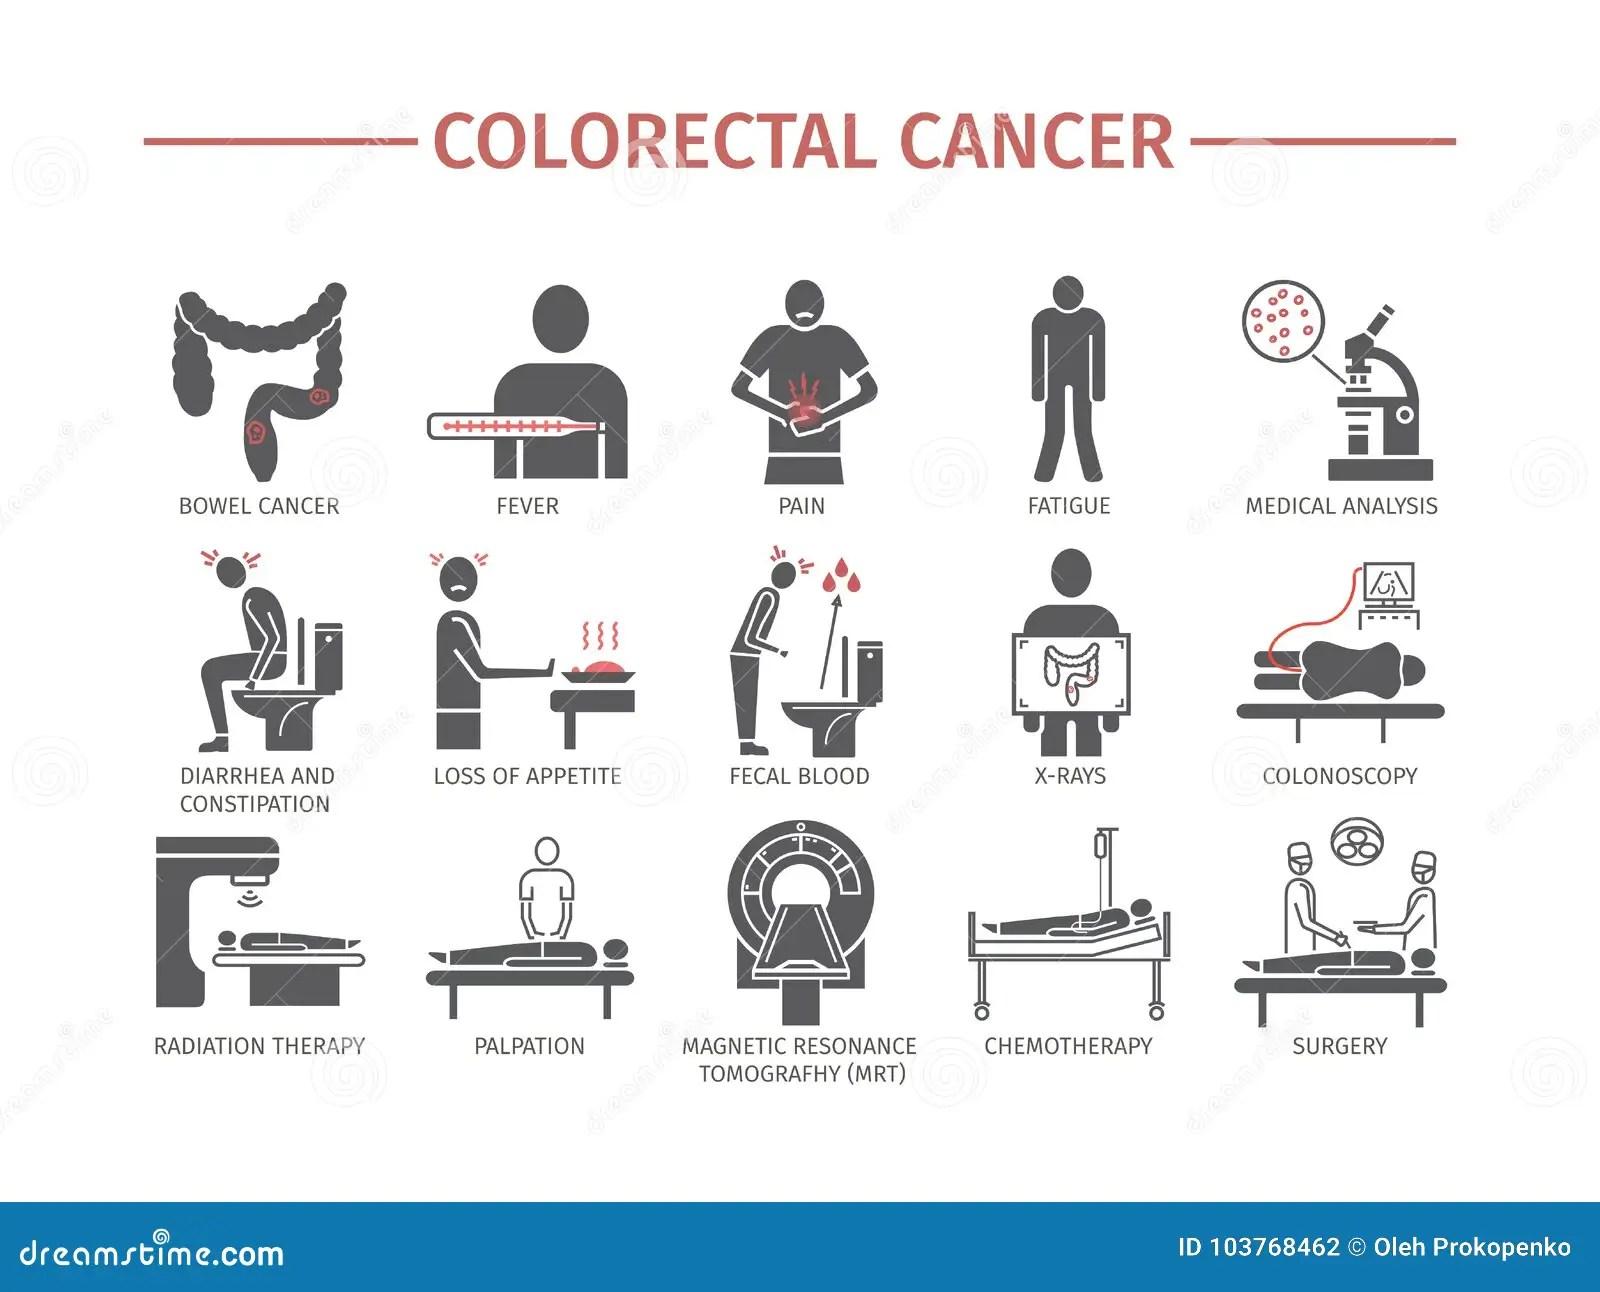 Colorectal Cancer Symptoms Diagnostics Flat Icons Set